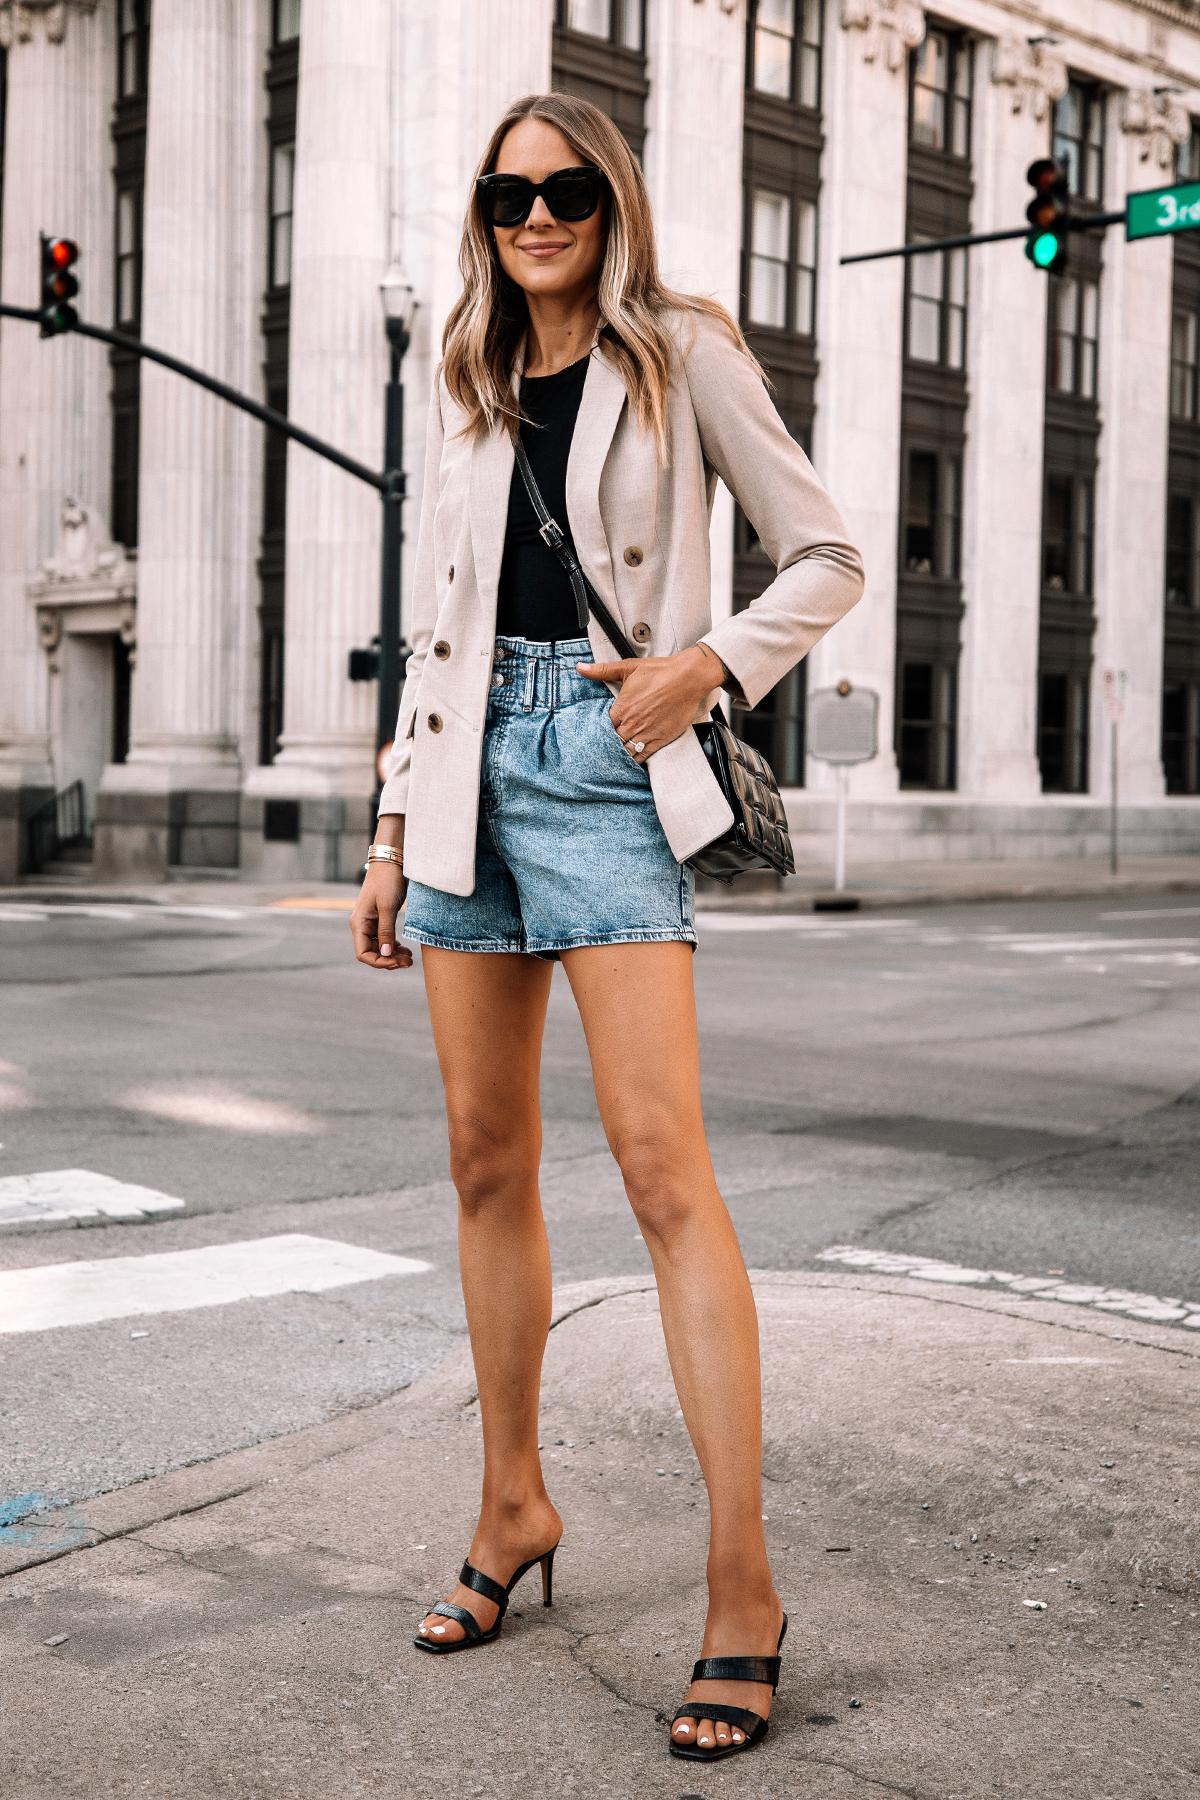 Fashion Jackson Wearing Beige Blazer Denim Shorts Black Heels Street Style Spring Outfit 2